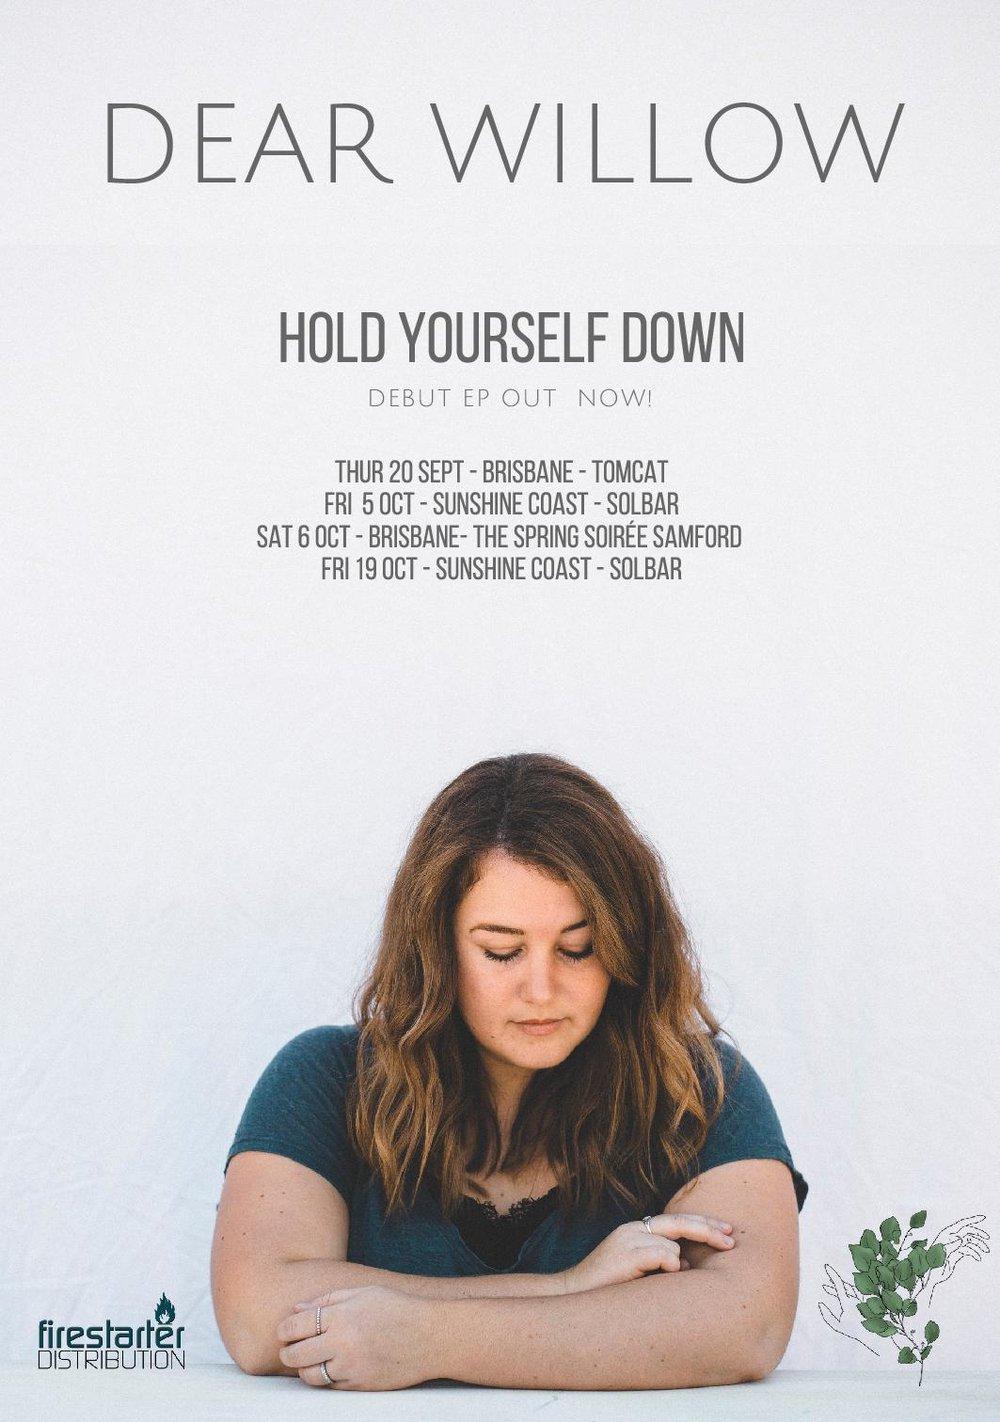 Dear Willow EP poster.jpg